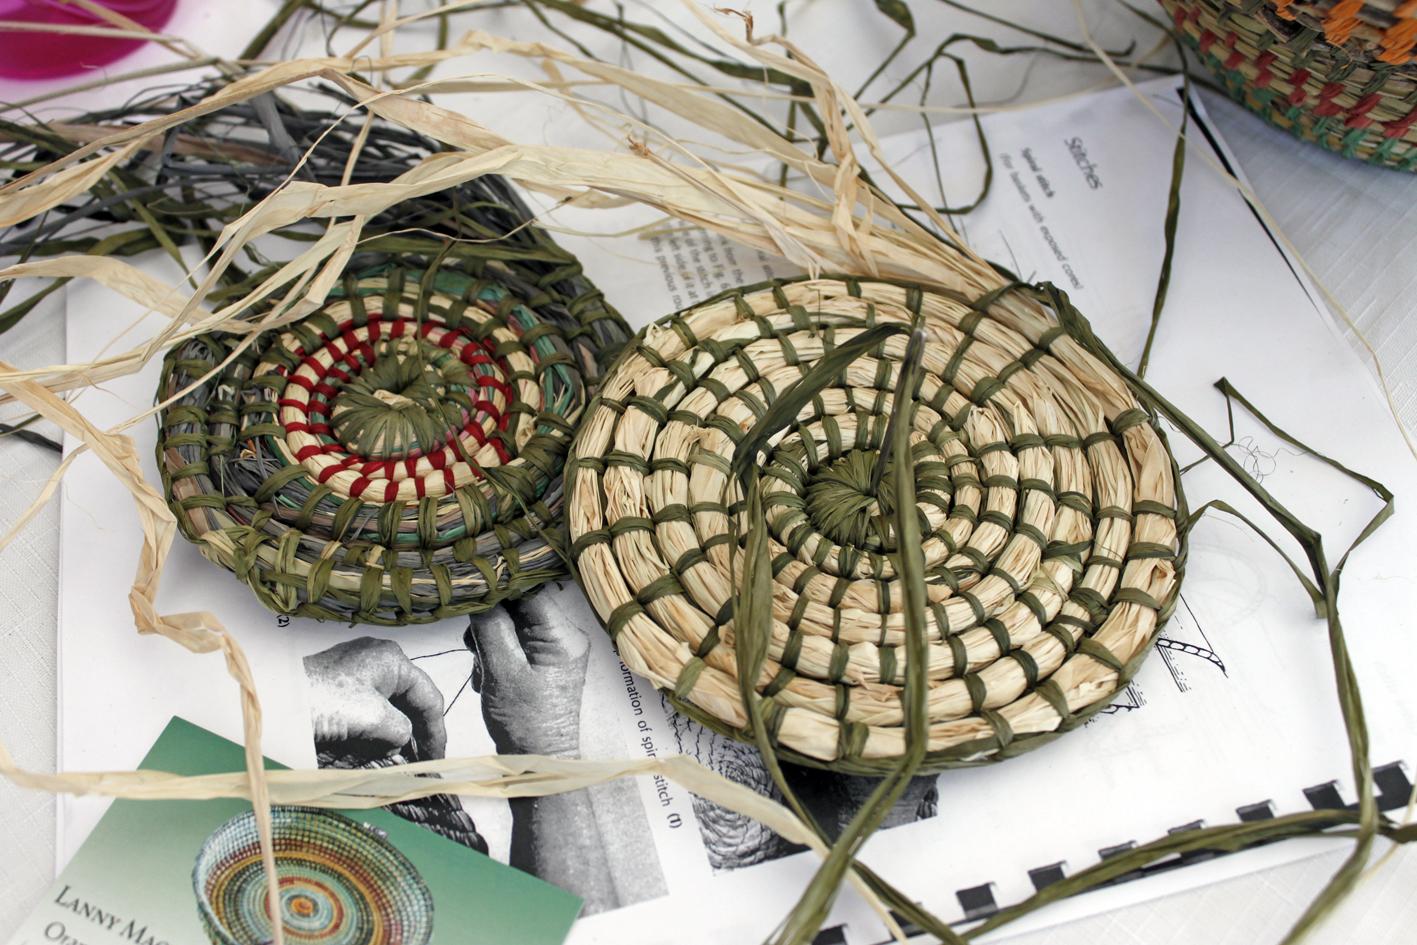 Basket Weaving Workshop with fibre artist Lanny Mackenzie, The Corner Store Gallery, Orange NSW